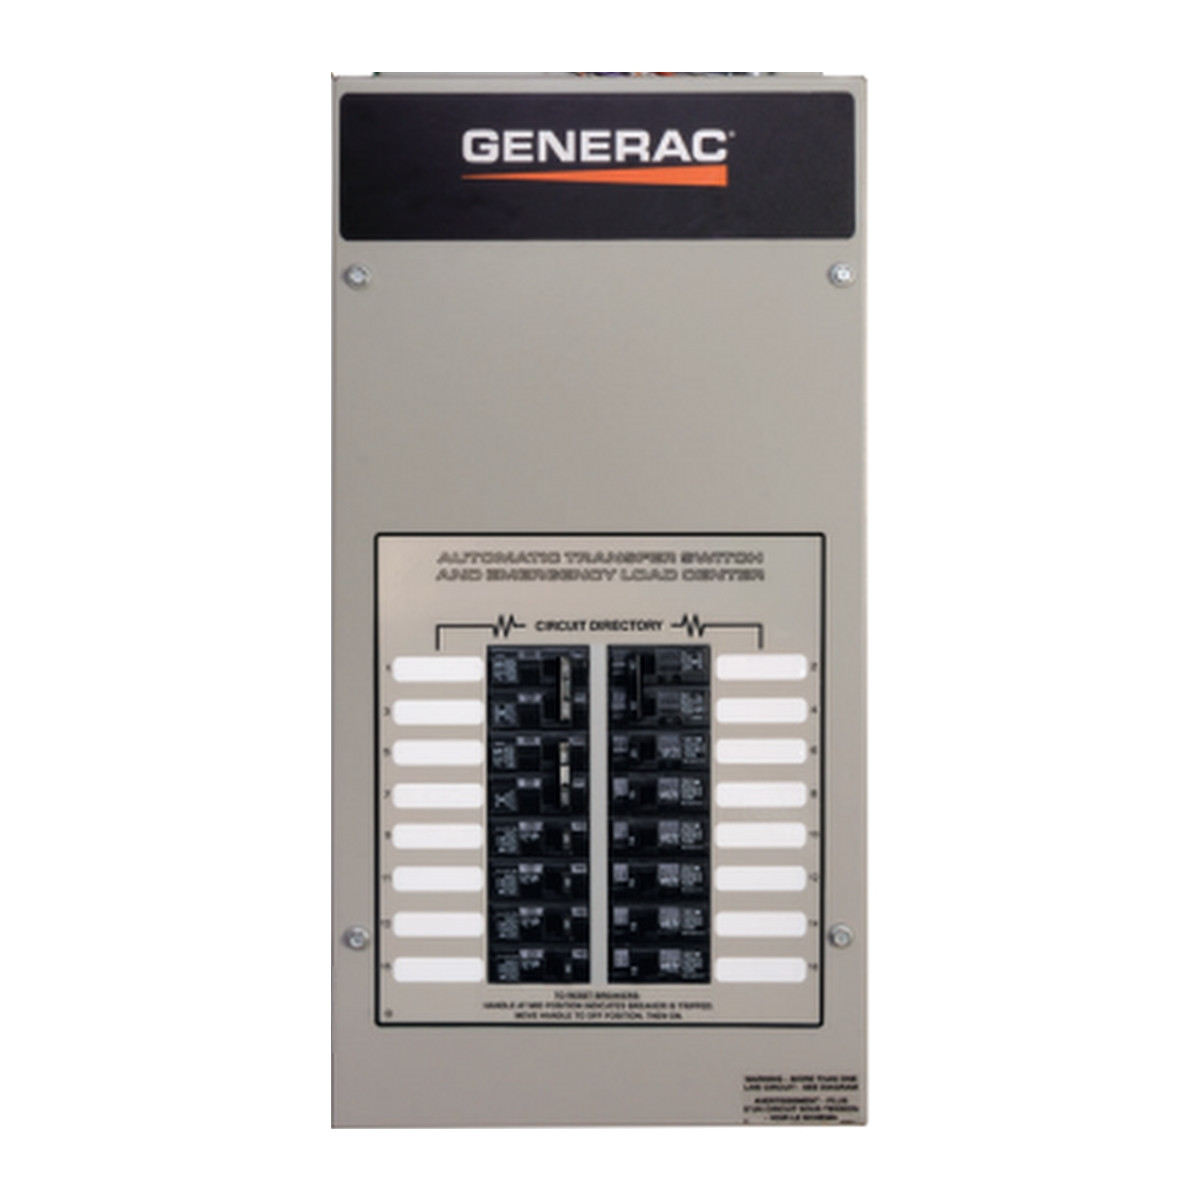 Rxg10eza1 Generac 50a 10 Circuit Transfer Switch W Load Center Kit Wiring Diagram 1 120 240v Nema Automatic With